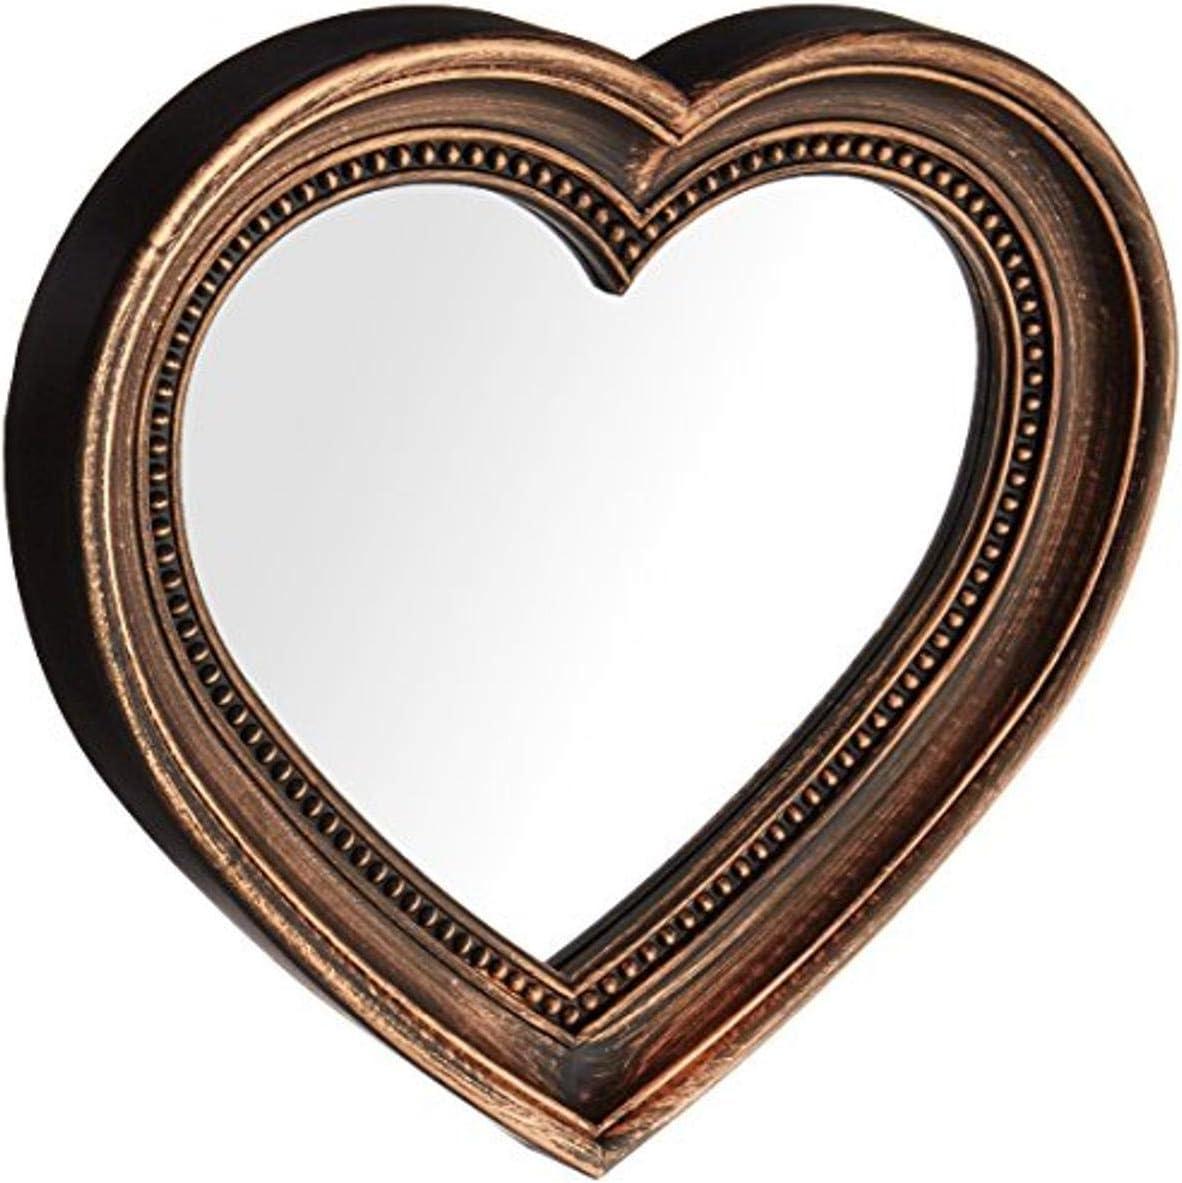 Kole OF938 Wall Mirror Antique Bronze Heart Shaped Mirror